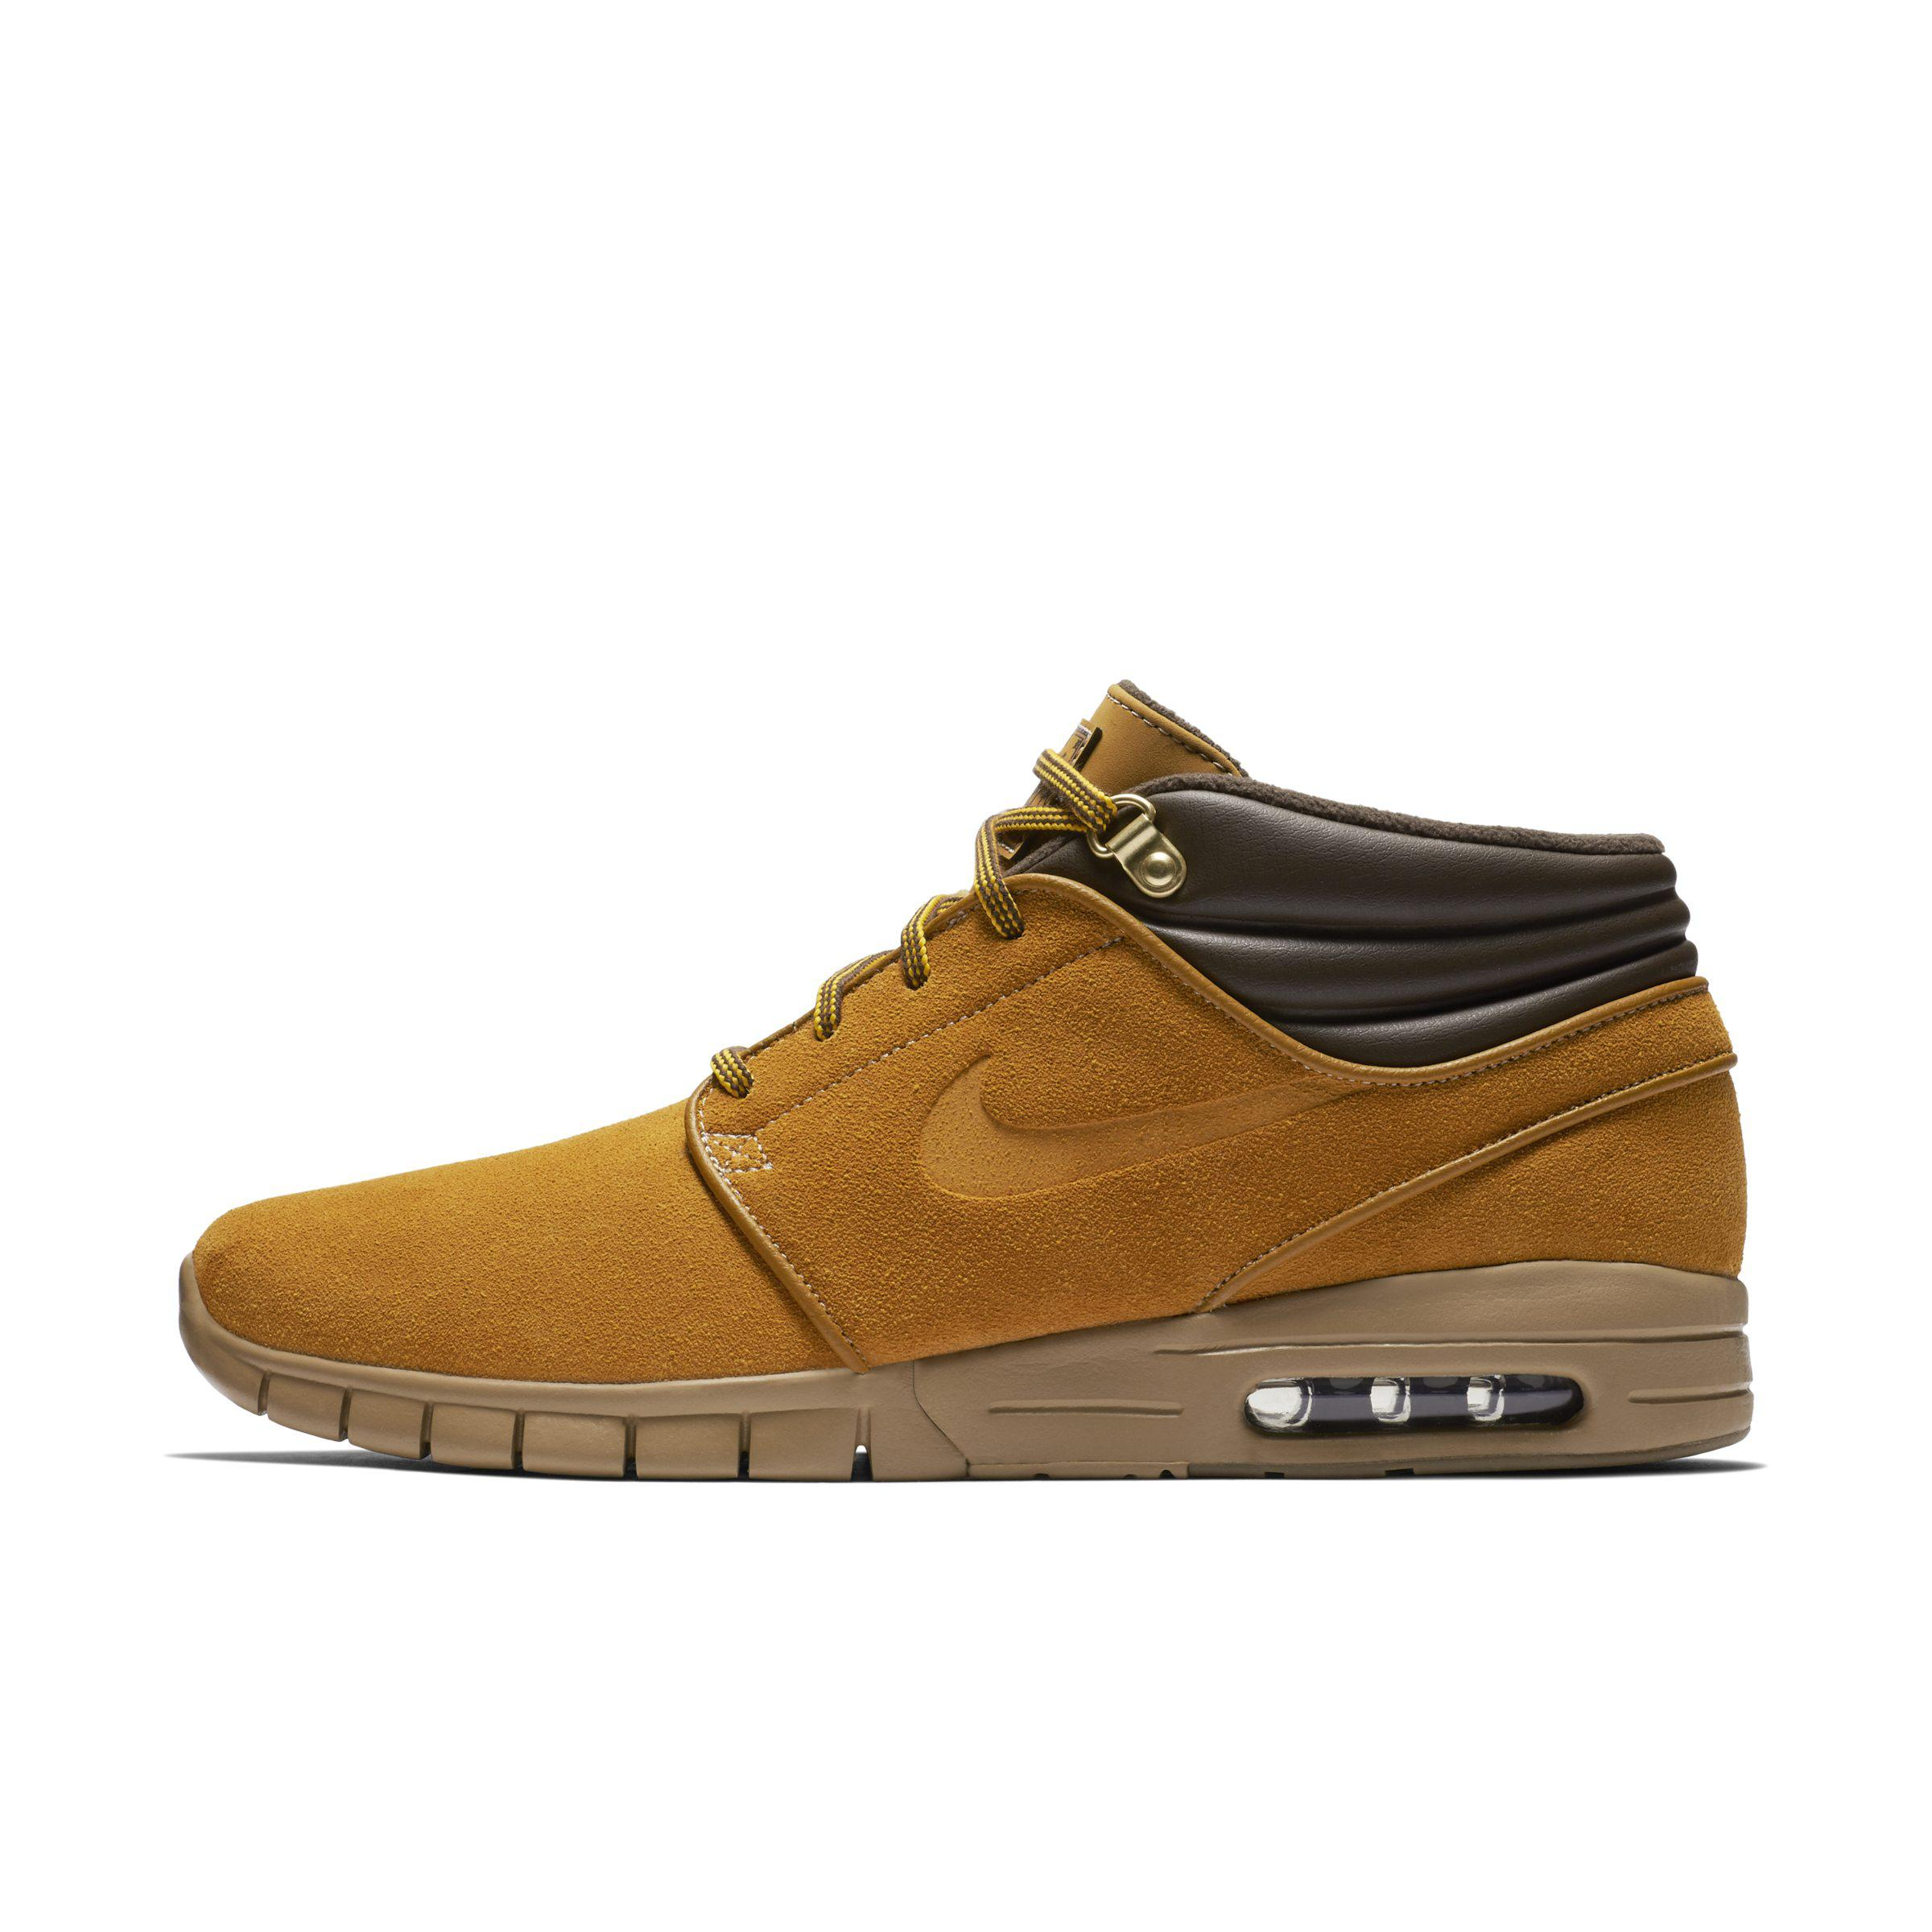 8e8d83b58c Nike Sb Stefan Janoski Max Mid Premium Men's Shoes (high-top ...